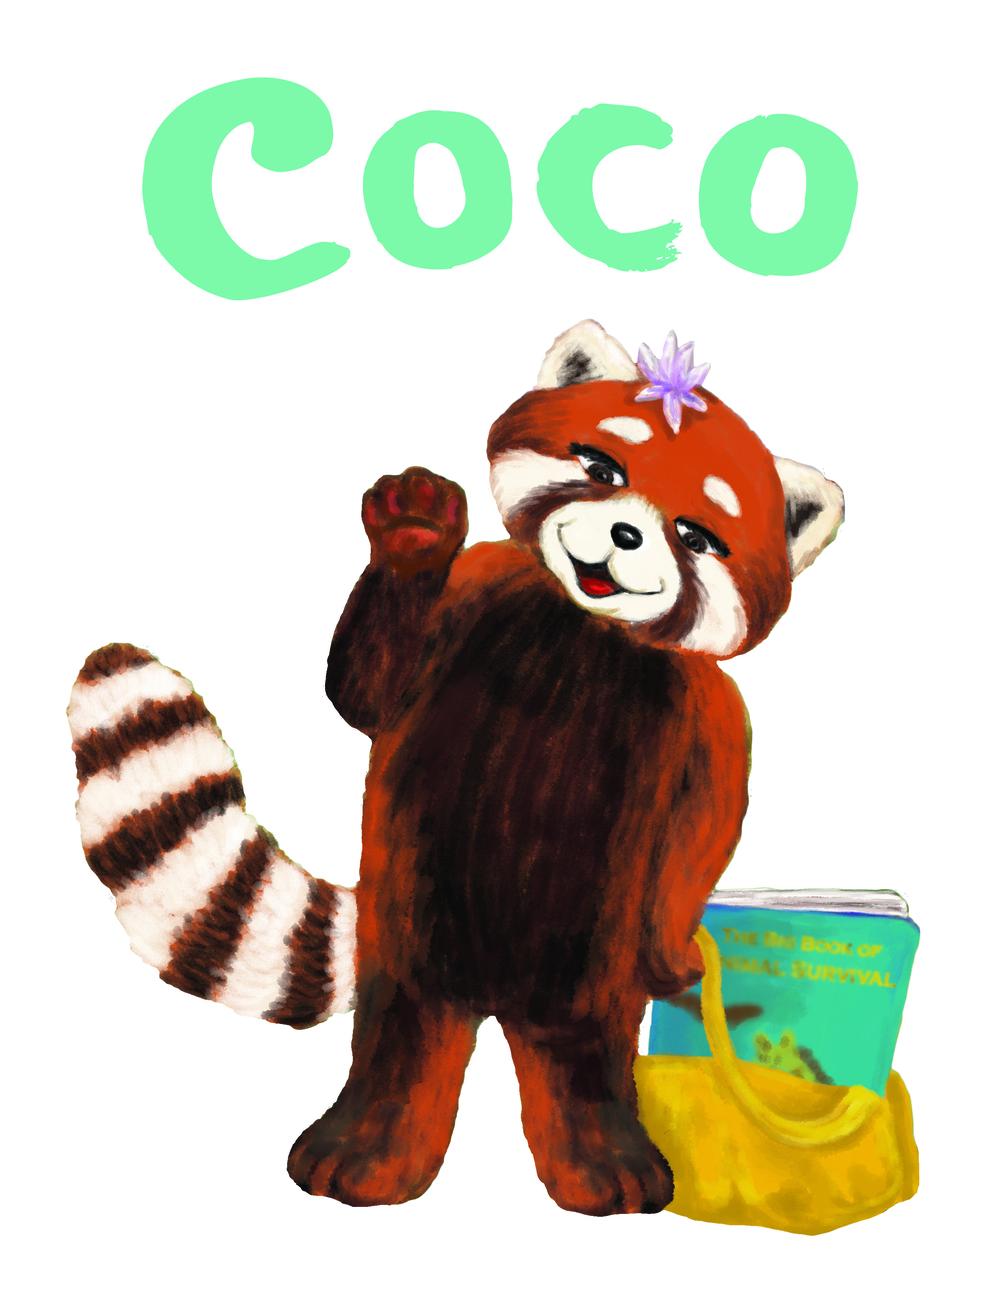 Coco_shirt.jpg